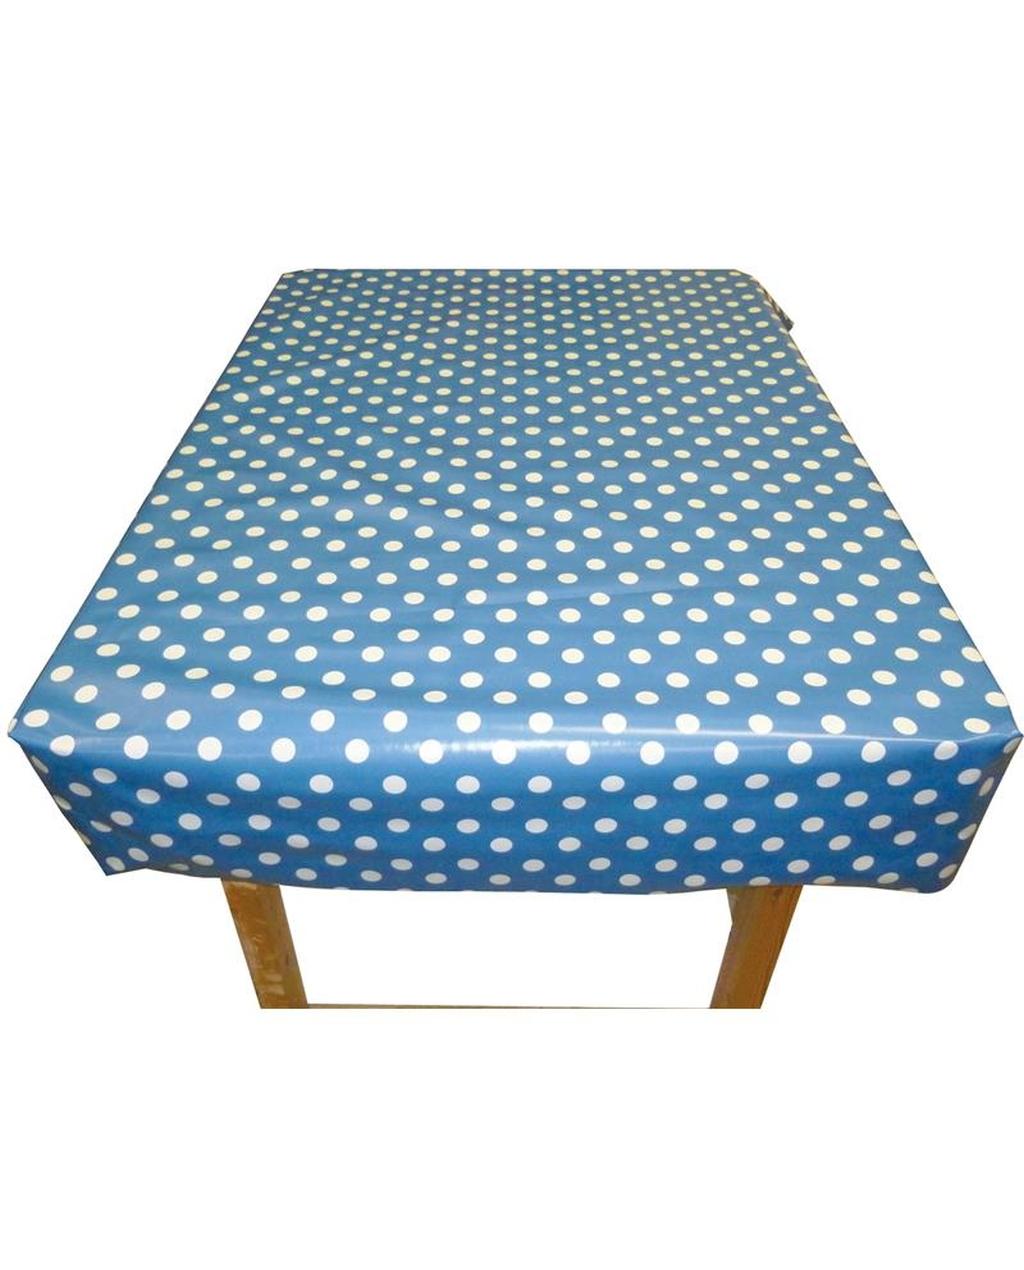 Blue Spot PVC Cover 1.4m x 1.7m